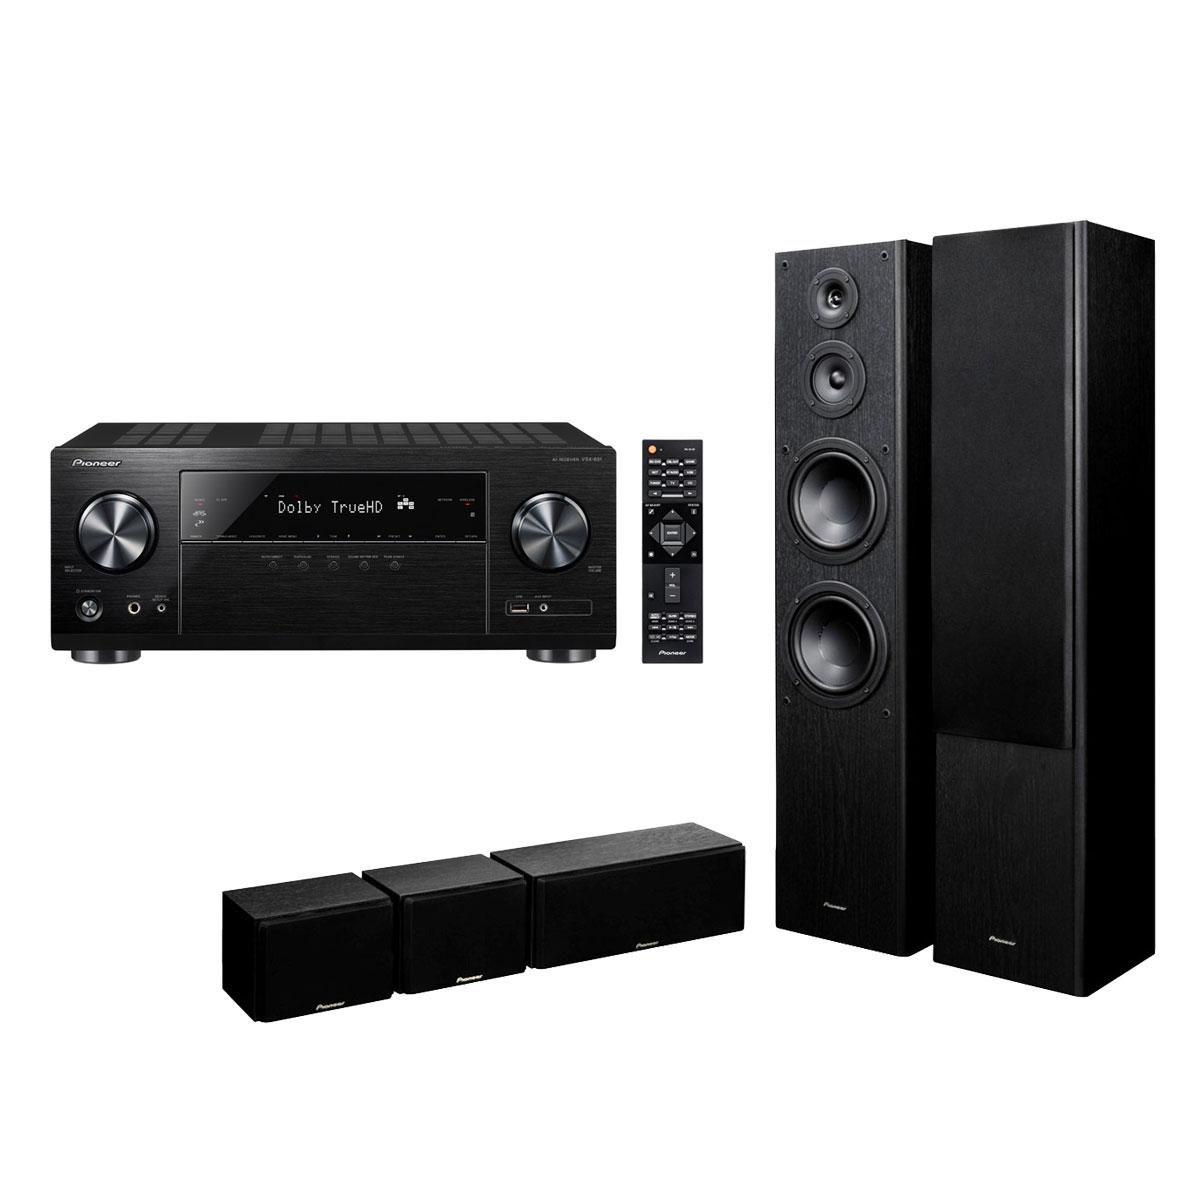 Ensemble home cinéma Pioneer VSX-831B + S-ES3TB Ampli-tuner Home Cinéma 5.1 Bluetooth, Wi-FI, Airplay, Google Cast, DLNA, HDCP 2.2, TuneIn, Spotify, Tidal, Deezer et Upscaling Ultra HD 4K avec 6 entrées HDMI + Pack d'enceintes 5.0